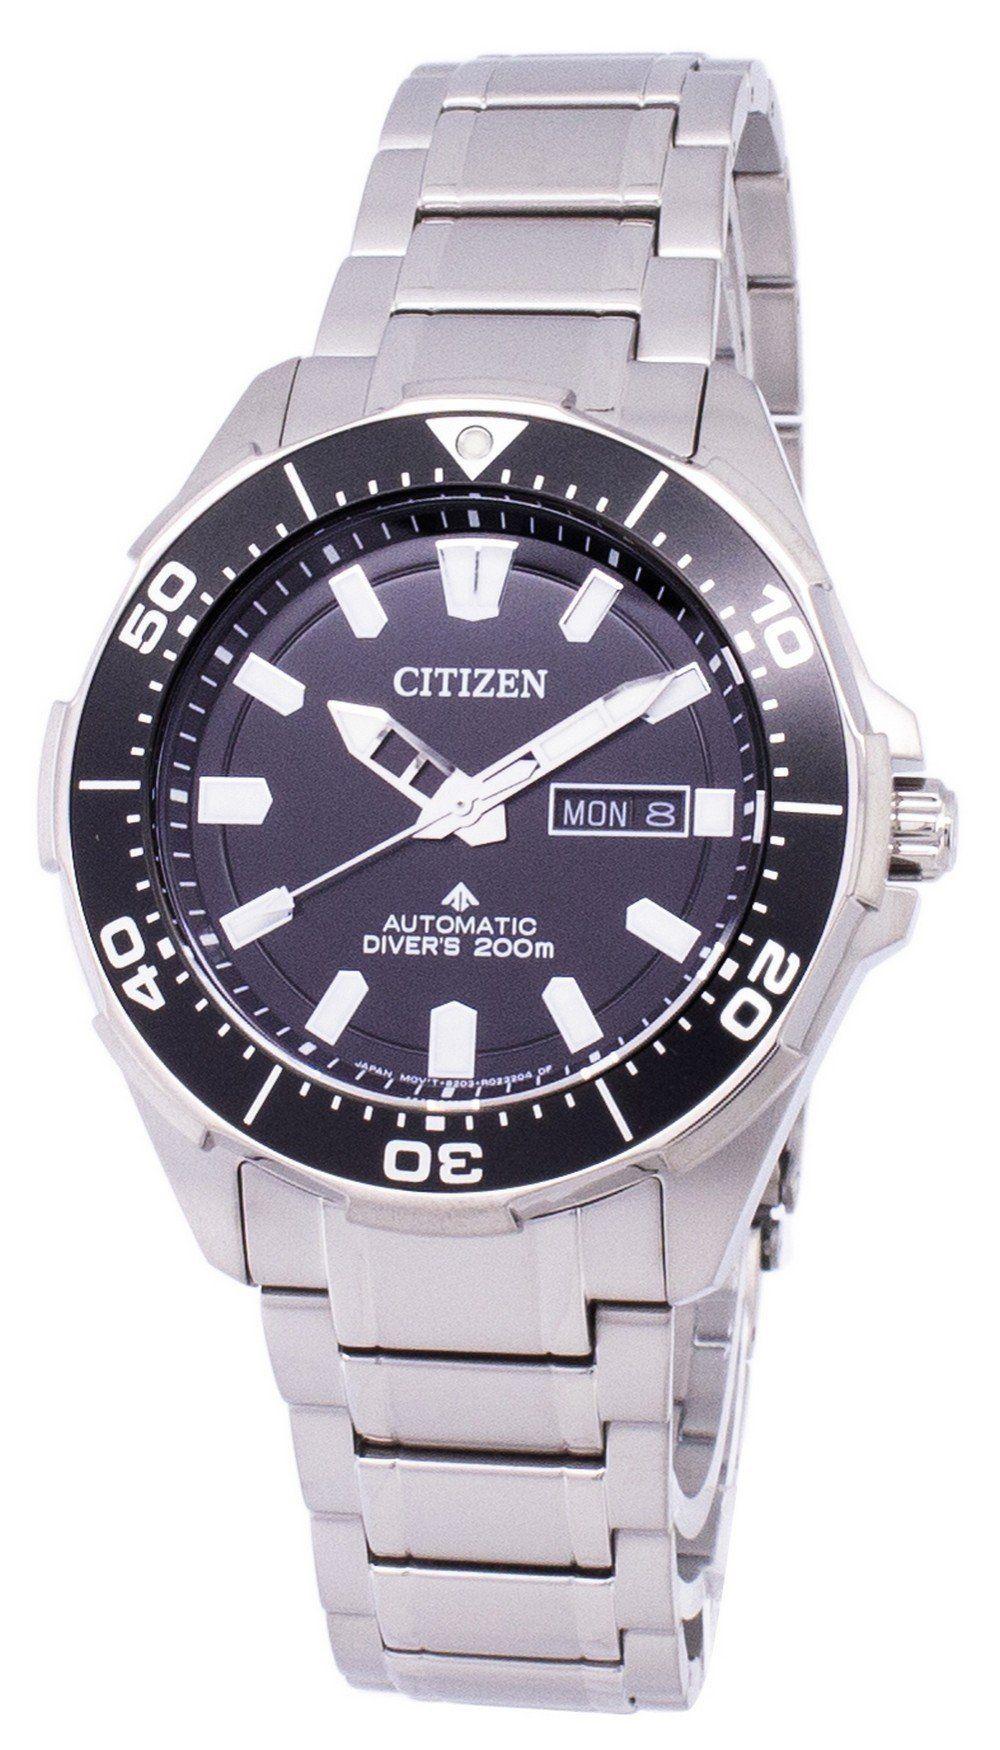 đồng hồ citizen sapphire